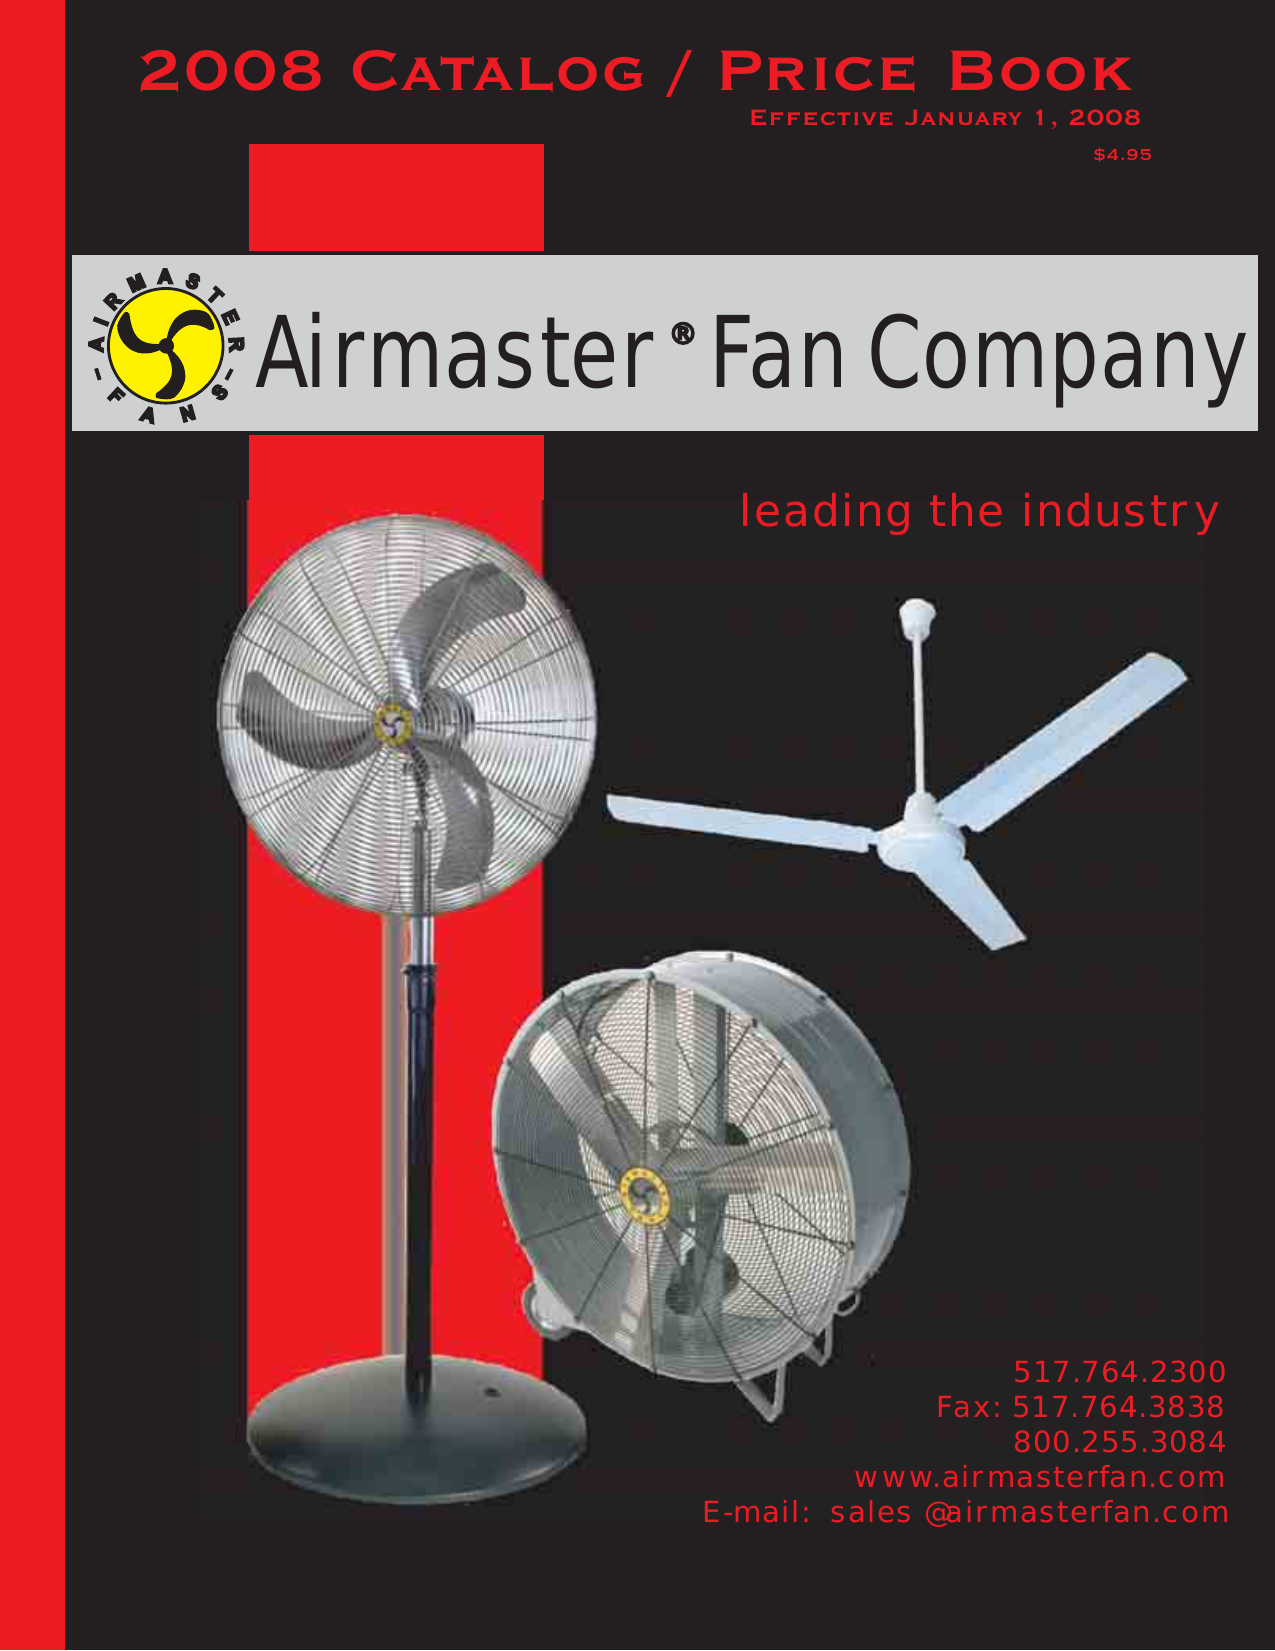 2008 Airmaster Catalog 101711 1 on